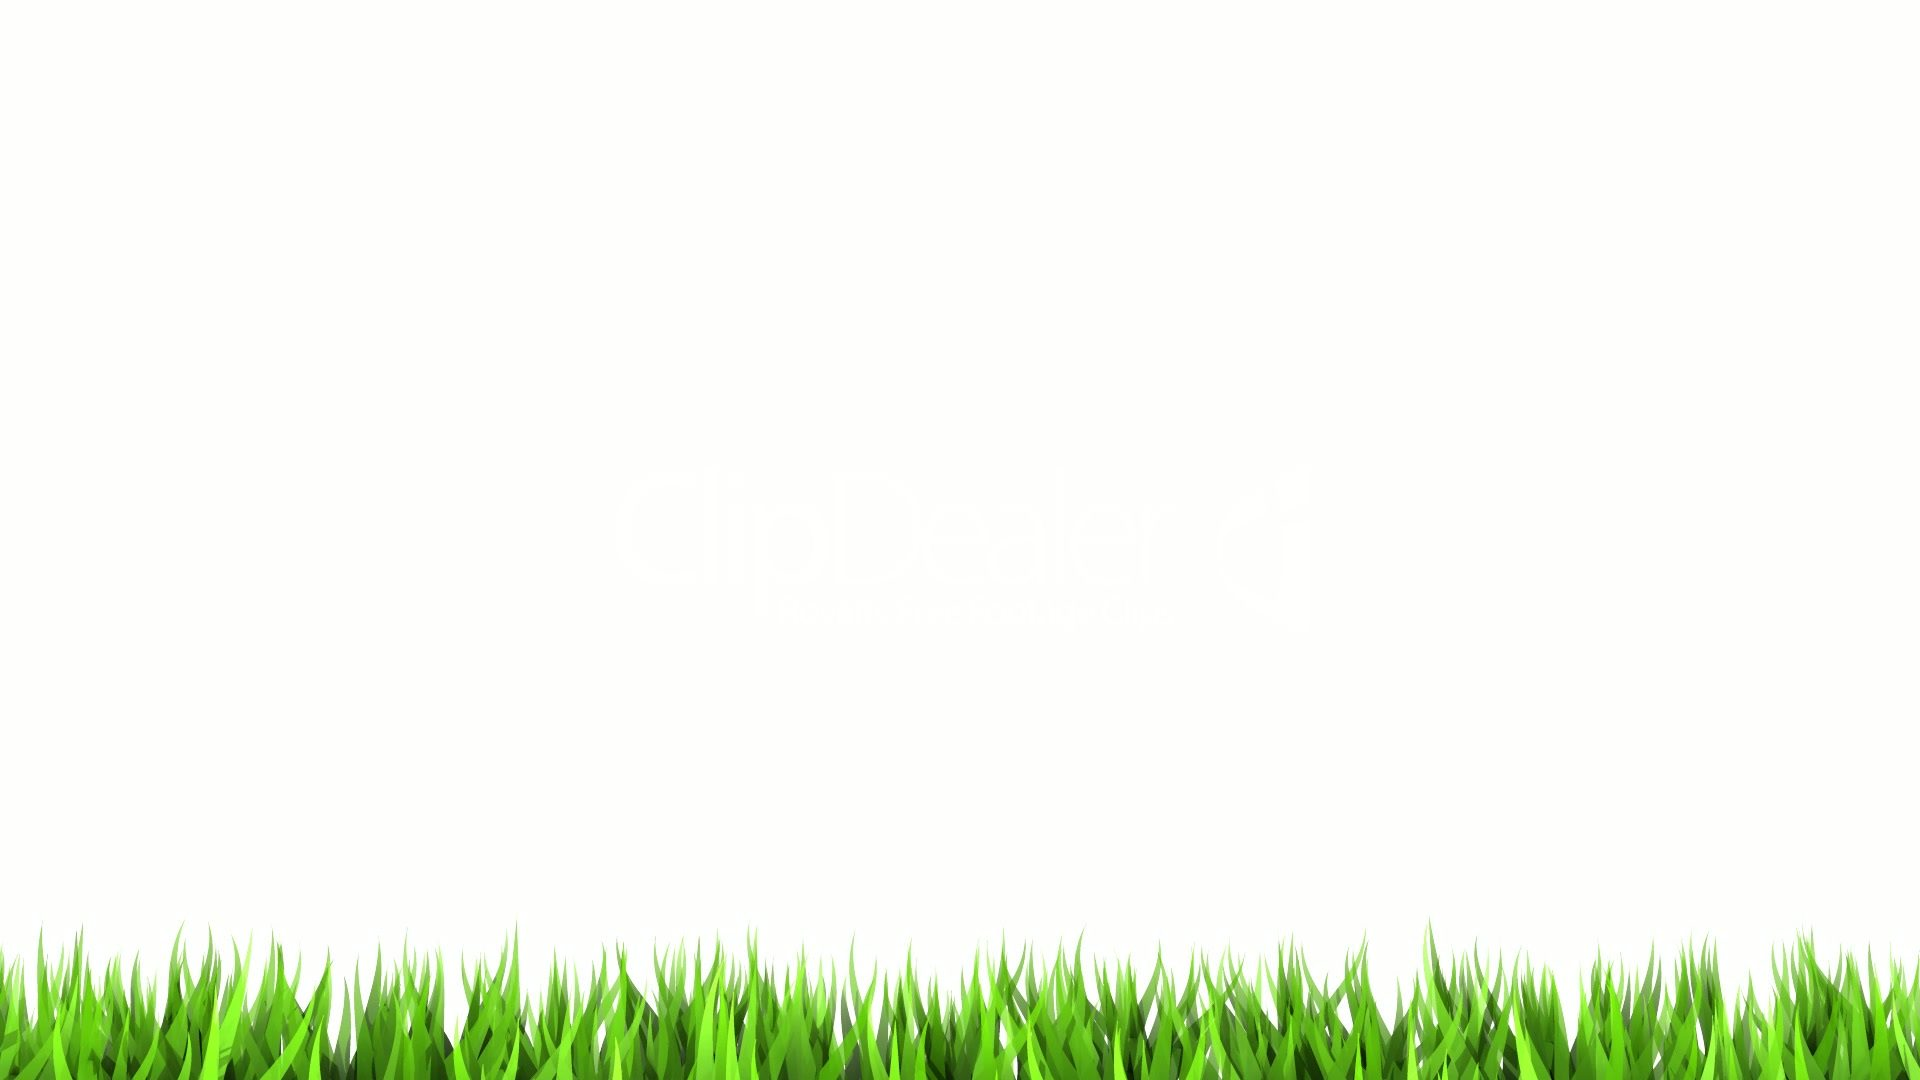 whitebackgroundwithgrass wpfaster